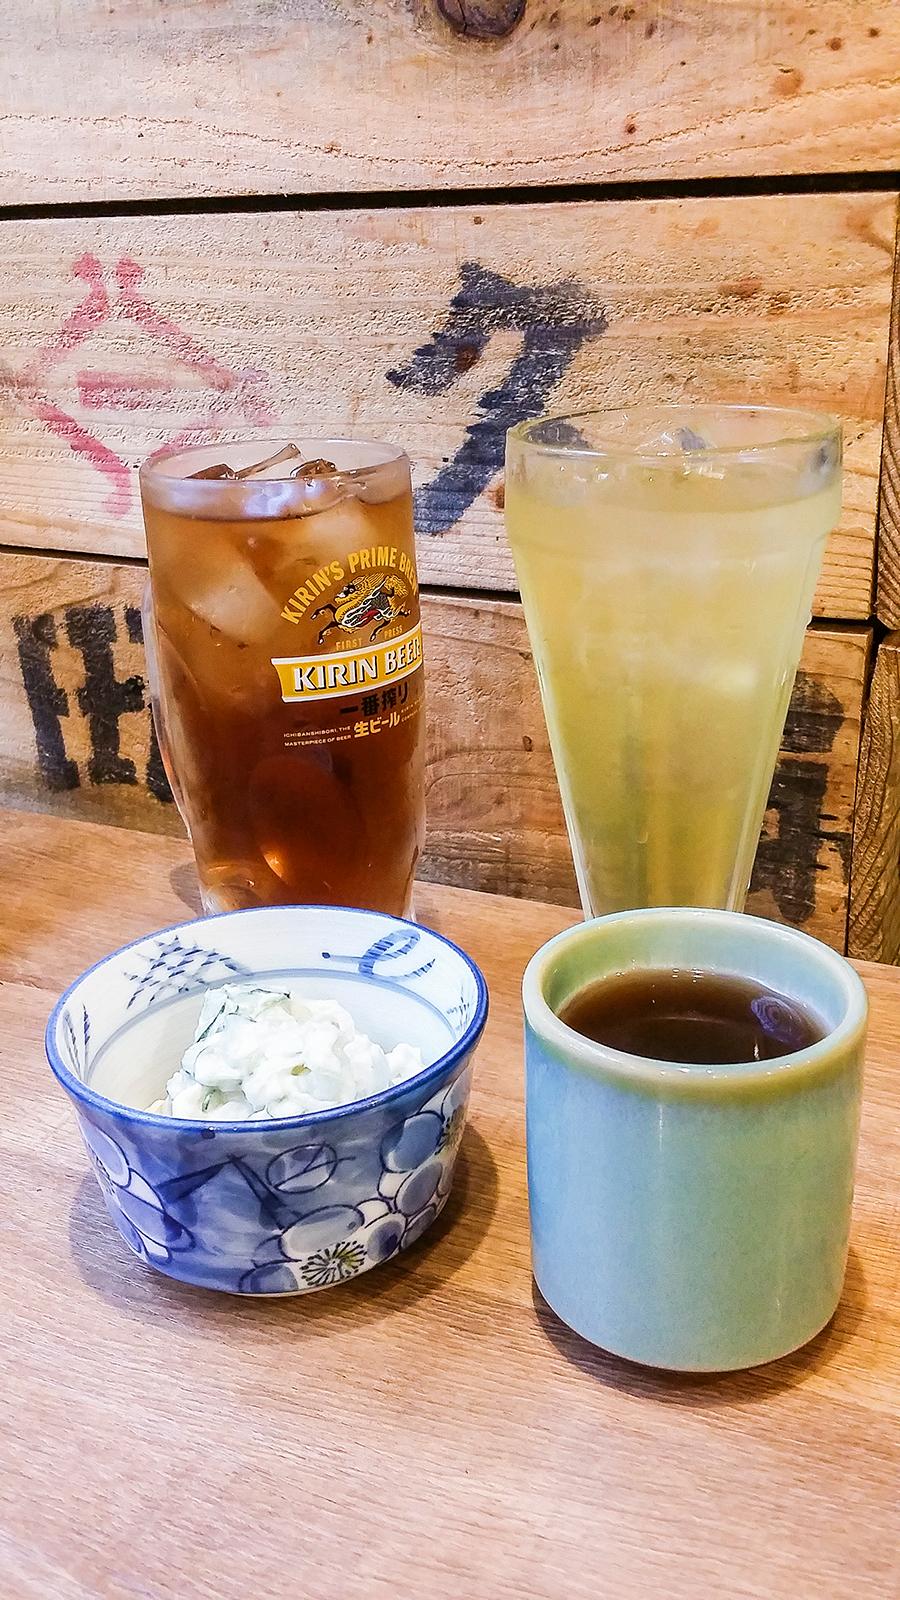 Potato Salad, Beer, Green tea at Isomaru Suisan in Tokyo, Japan.